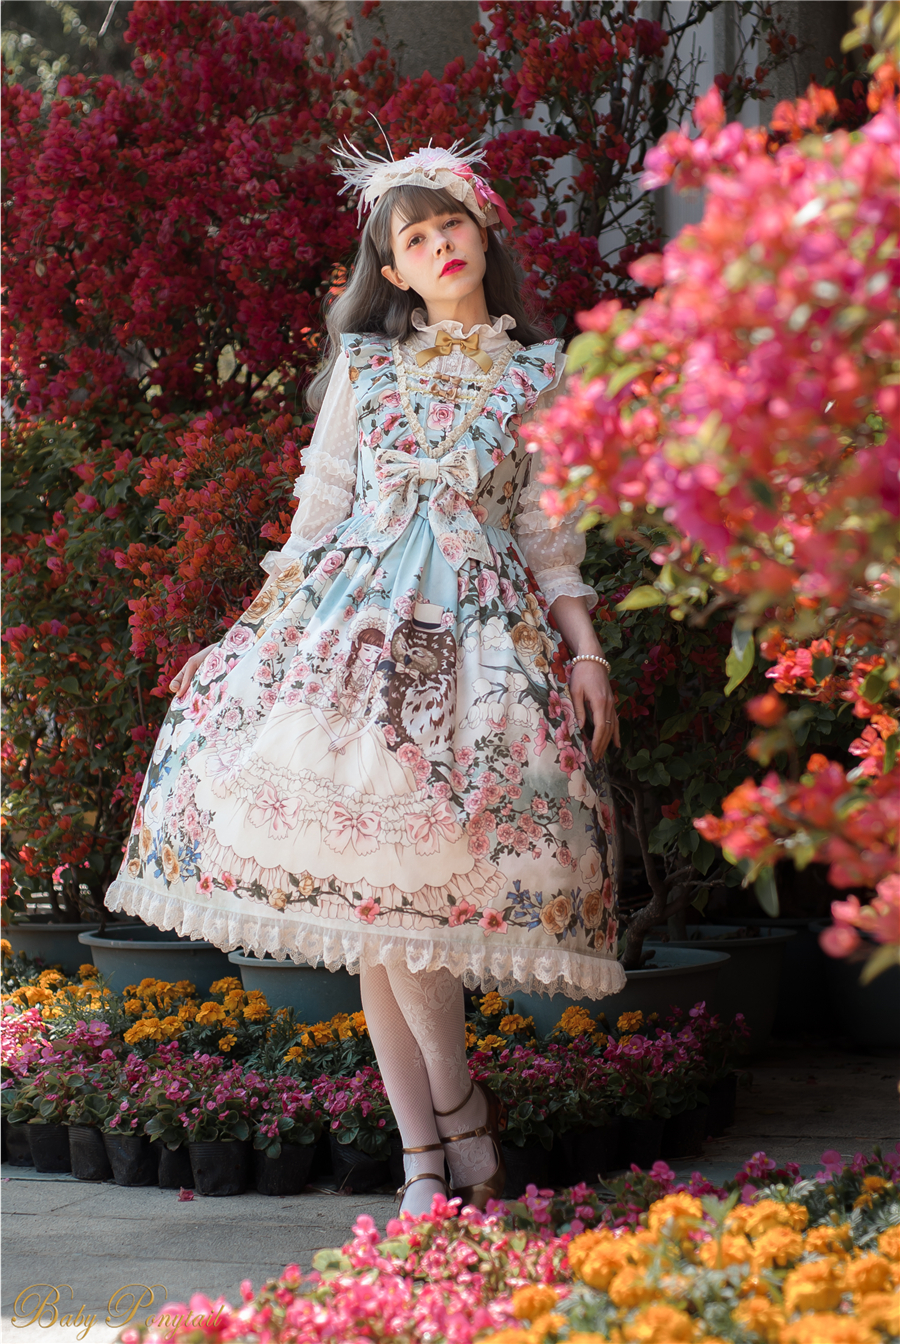 Baby Ponytail_Model Photo_Polly's Garden of Dreams_JSK Sky_Claudia20.jpg